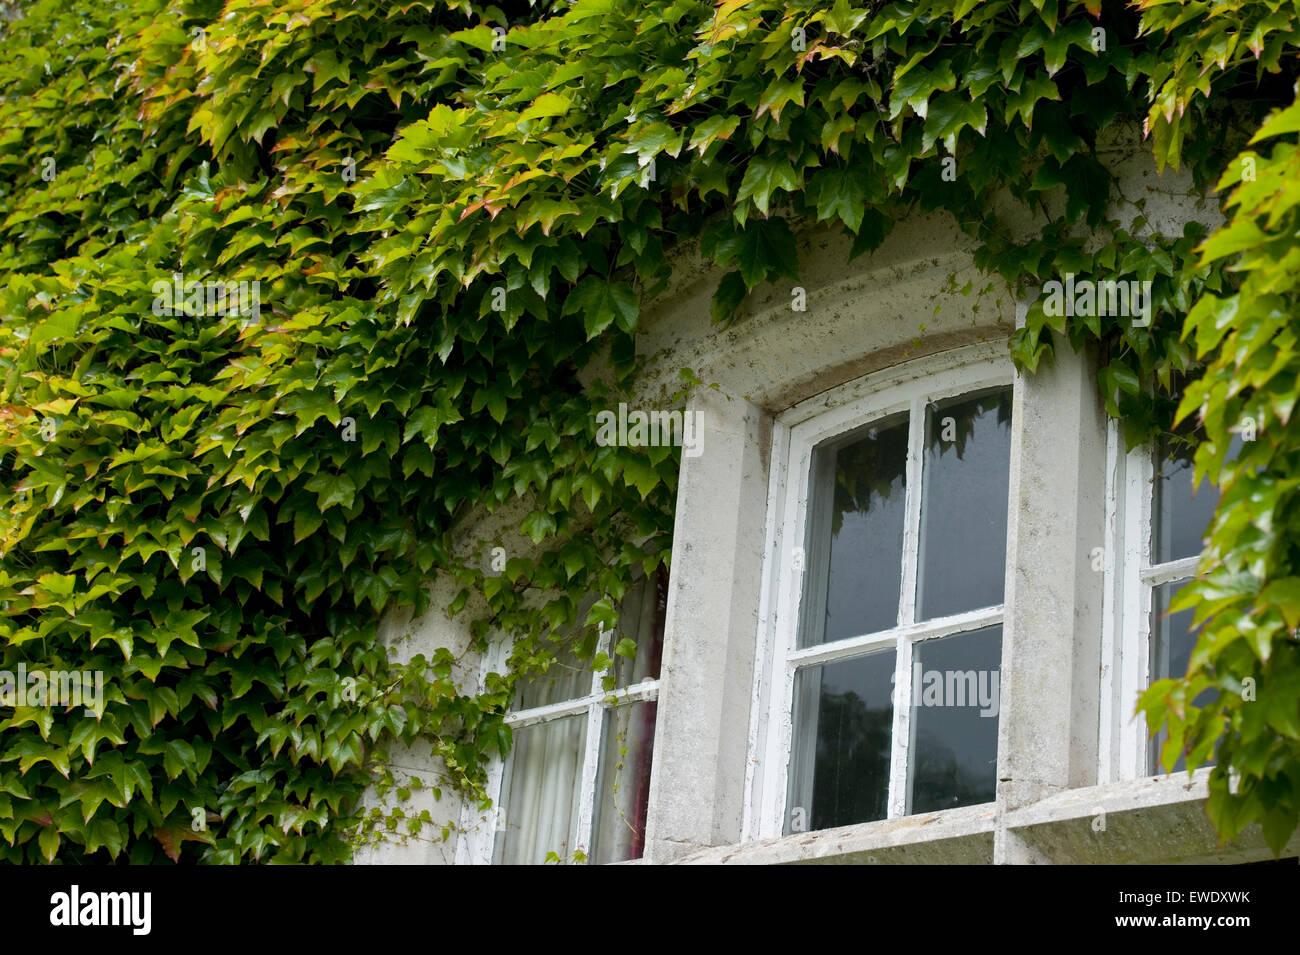 virginia creeper around an old house window - Stock Image